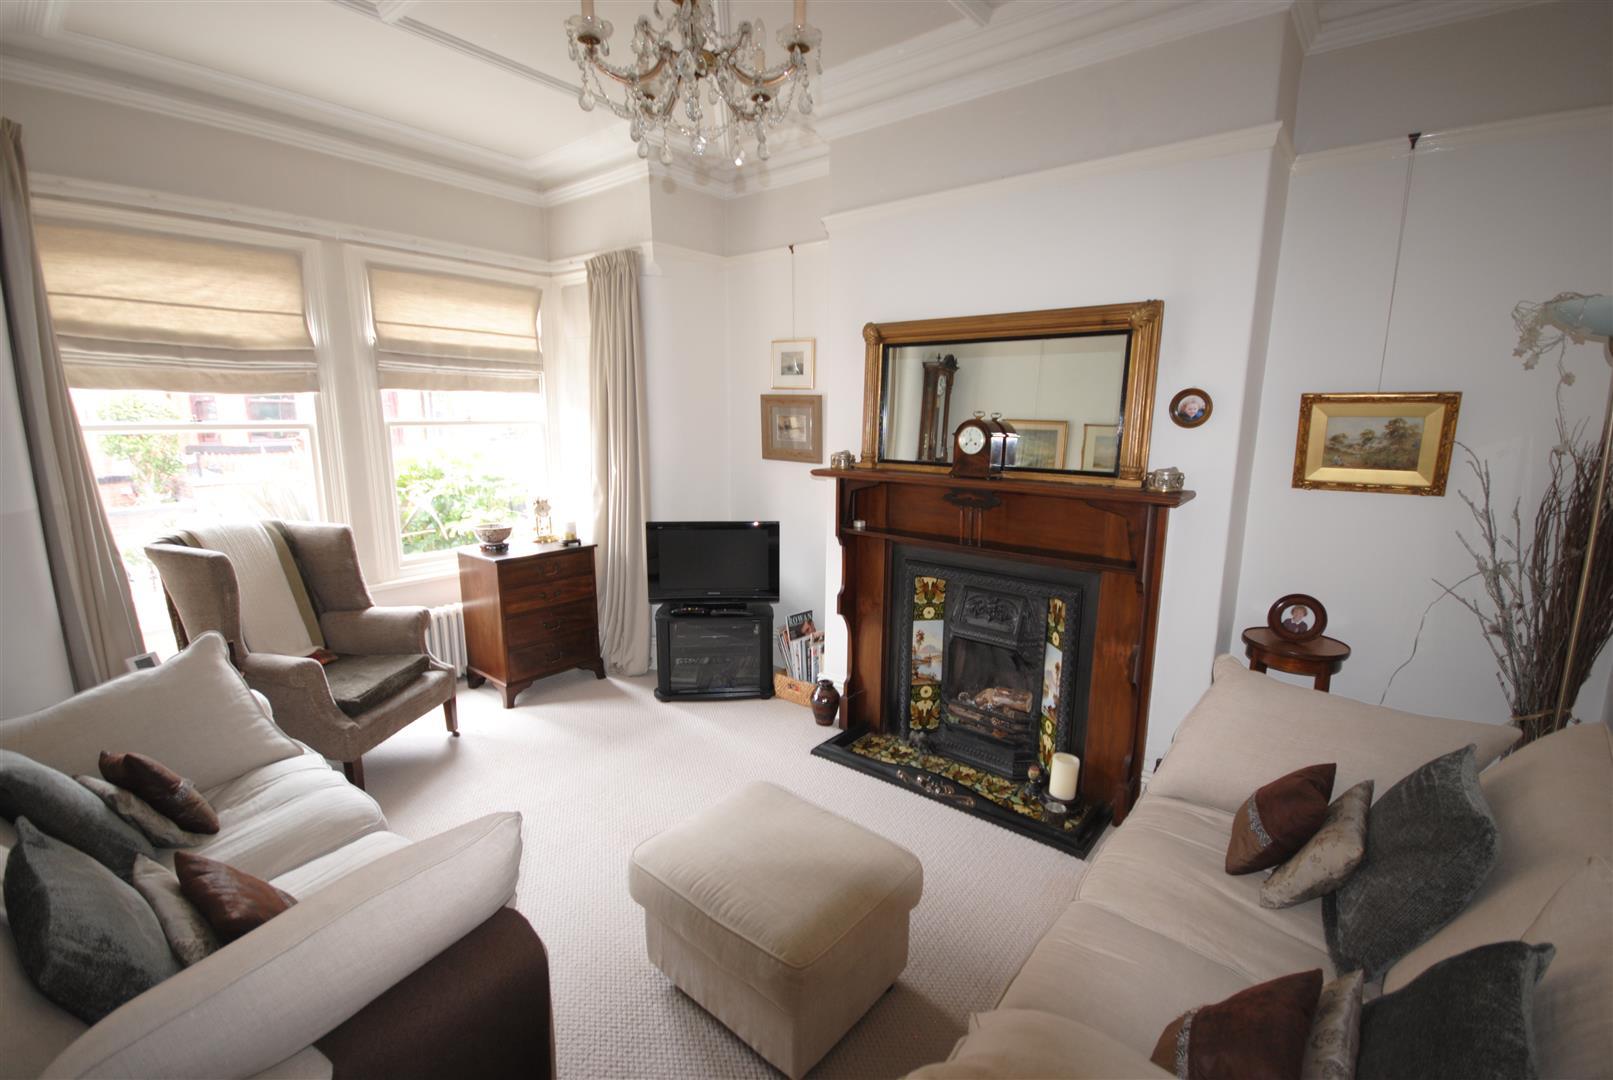 4 Bedrooms Property for sale in Sandycroft Avenue, Wigan